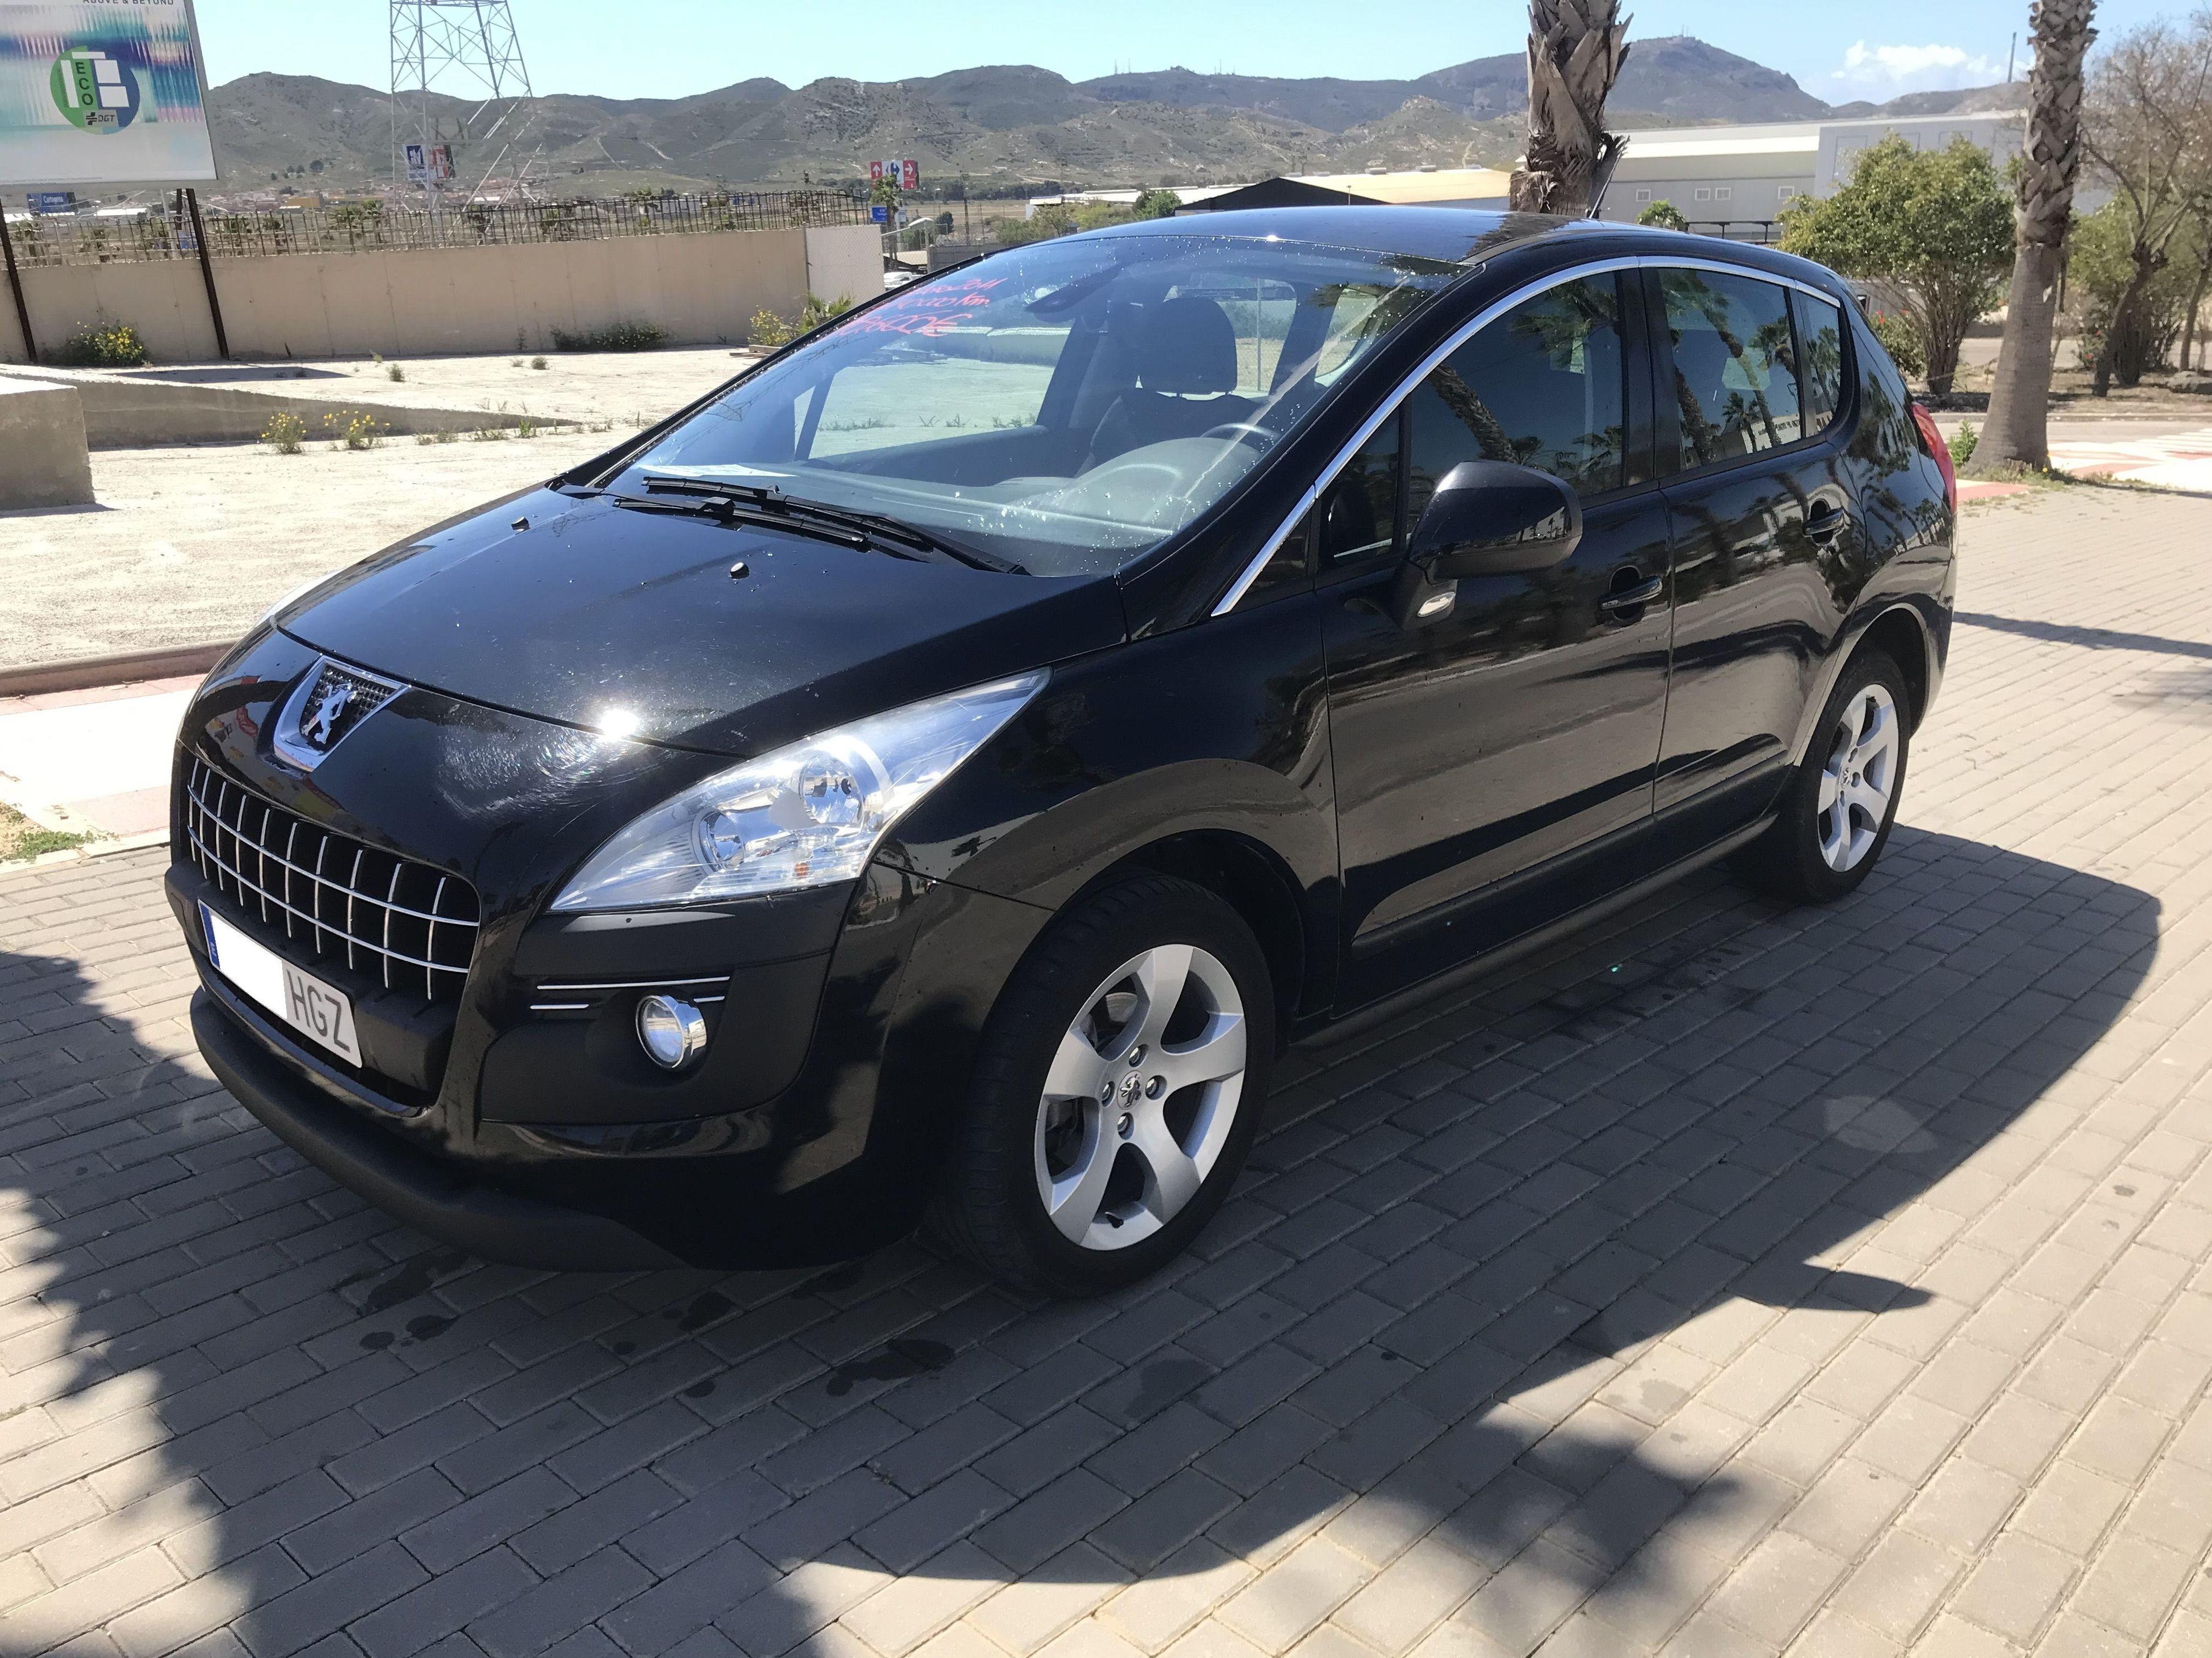 PEUGEOT 3008 HDI: COCHES DE OCASION de Automóviles Parque Mediterráneo